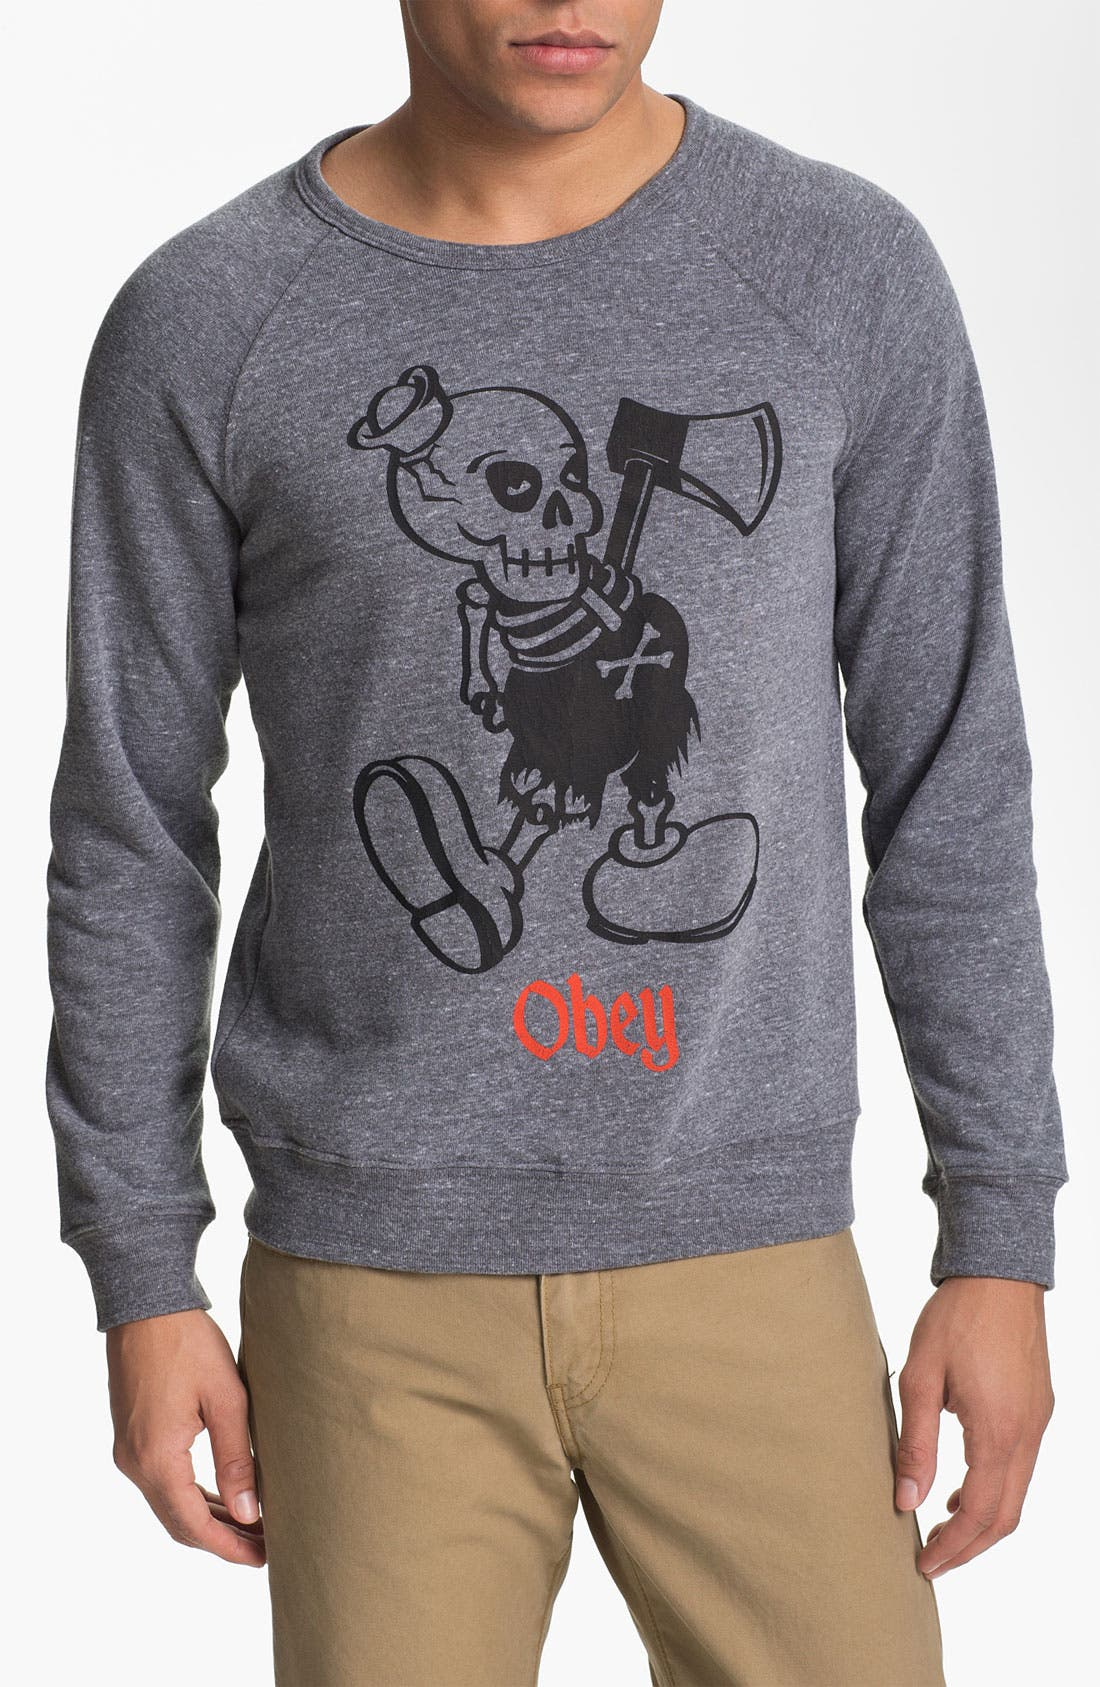 Main Image - Obey 'Oh Boy' Graphic Crewneck Sweatshirt